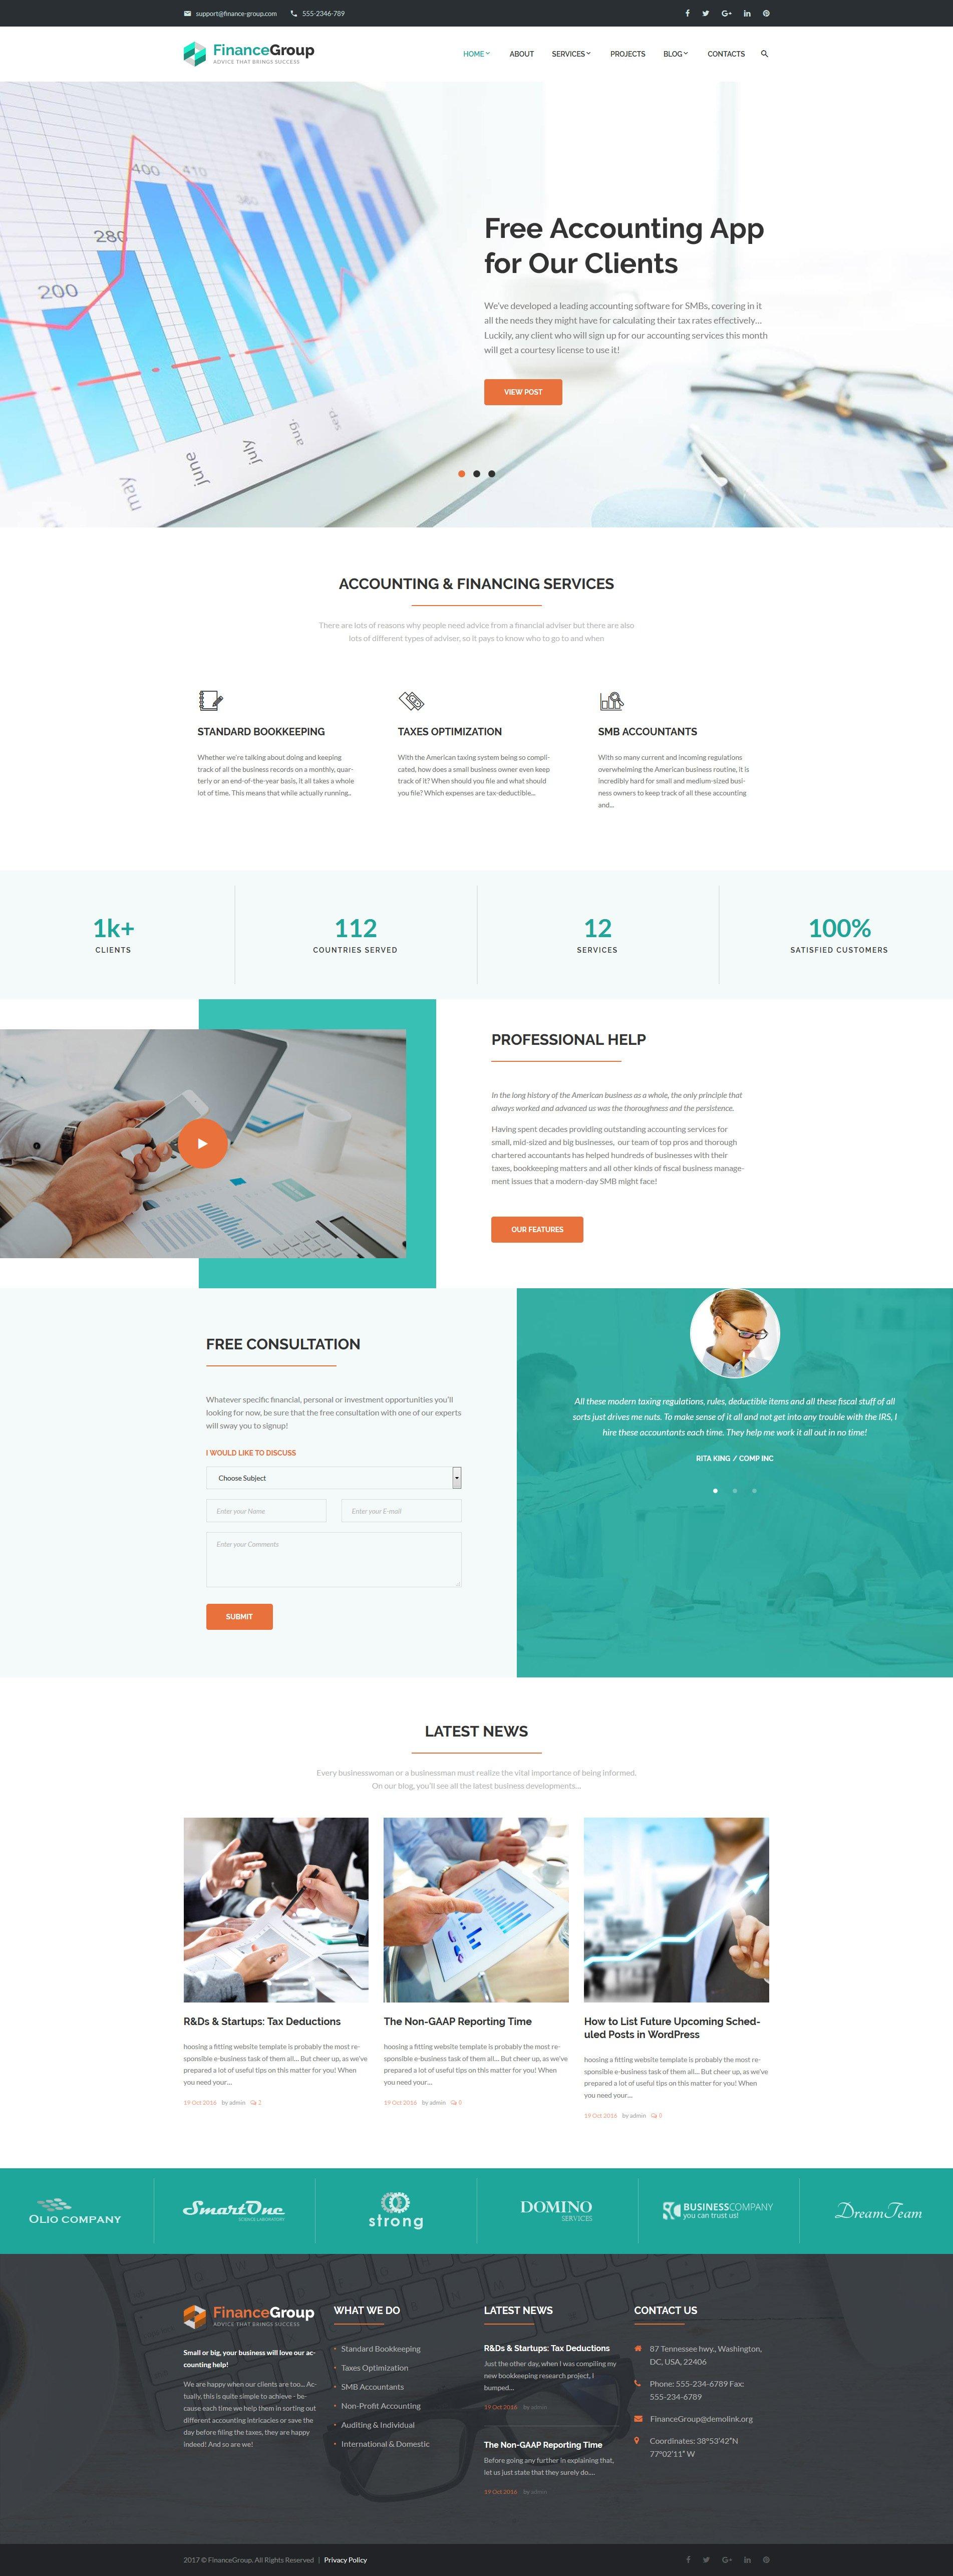 FinanceGroup - Accounting & Finance Business WordPress Theme - screenshot